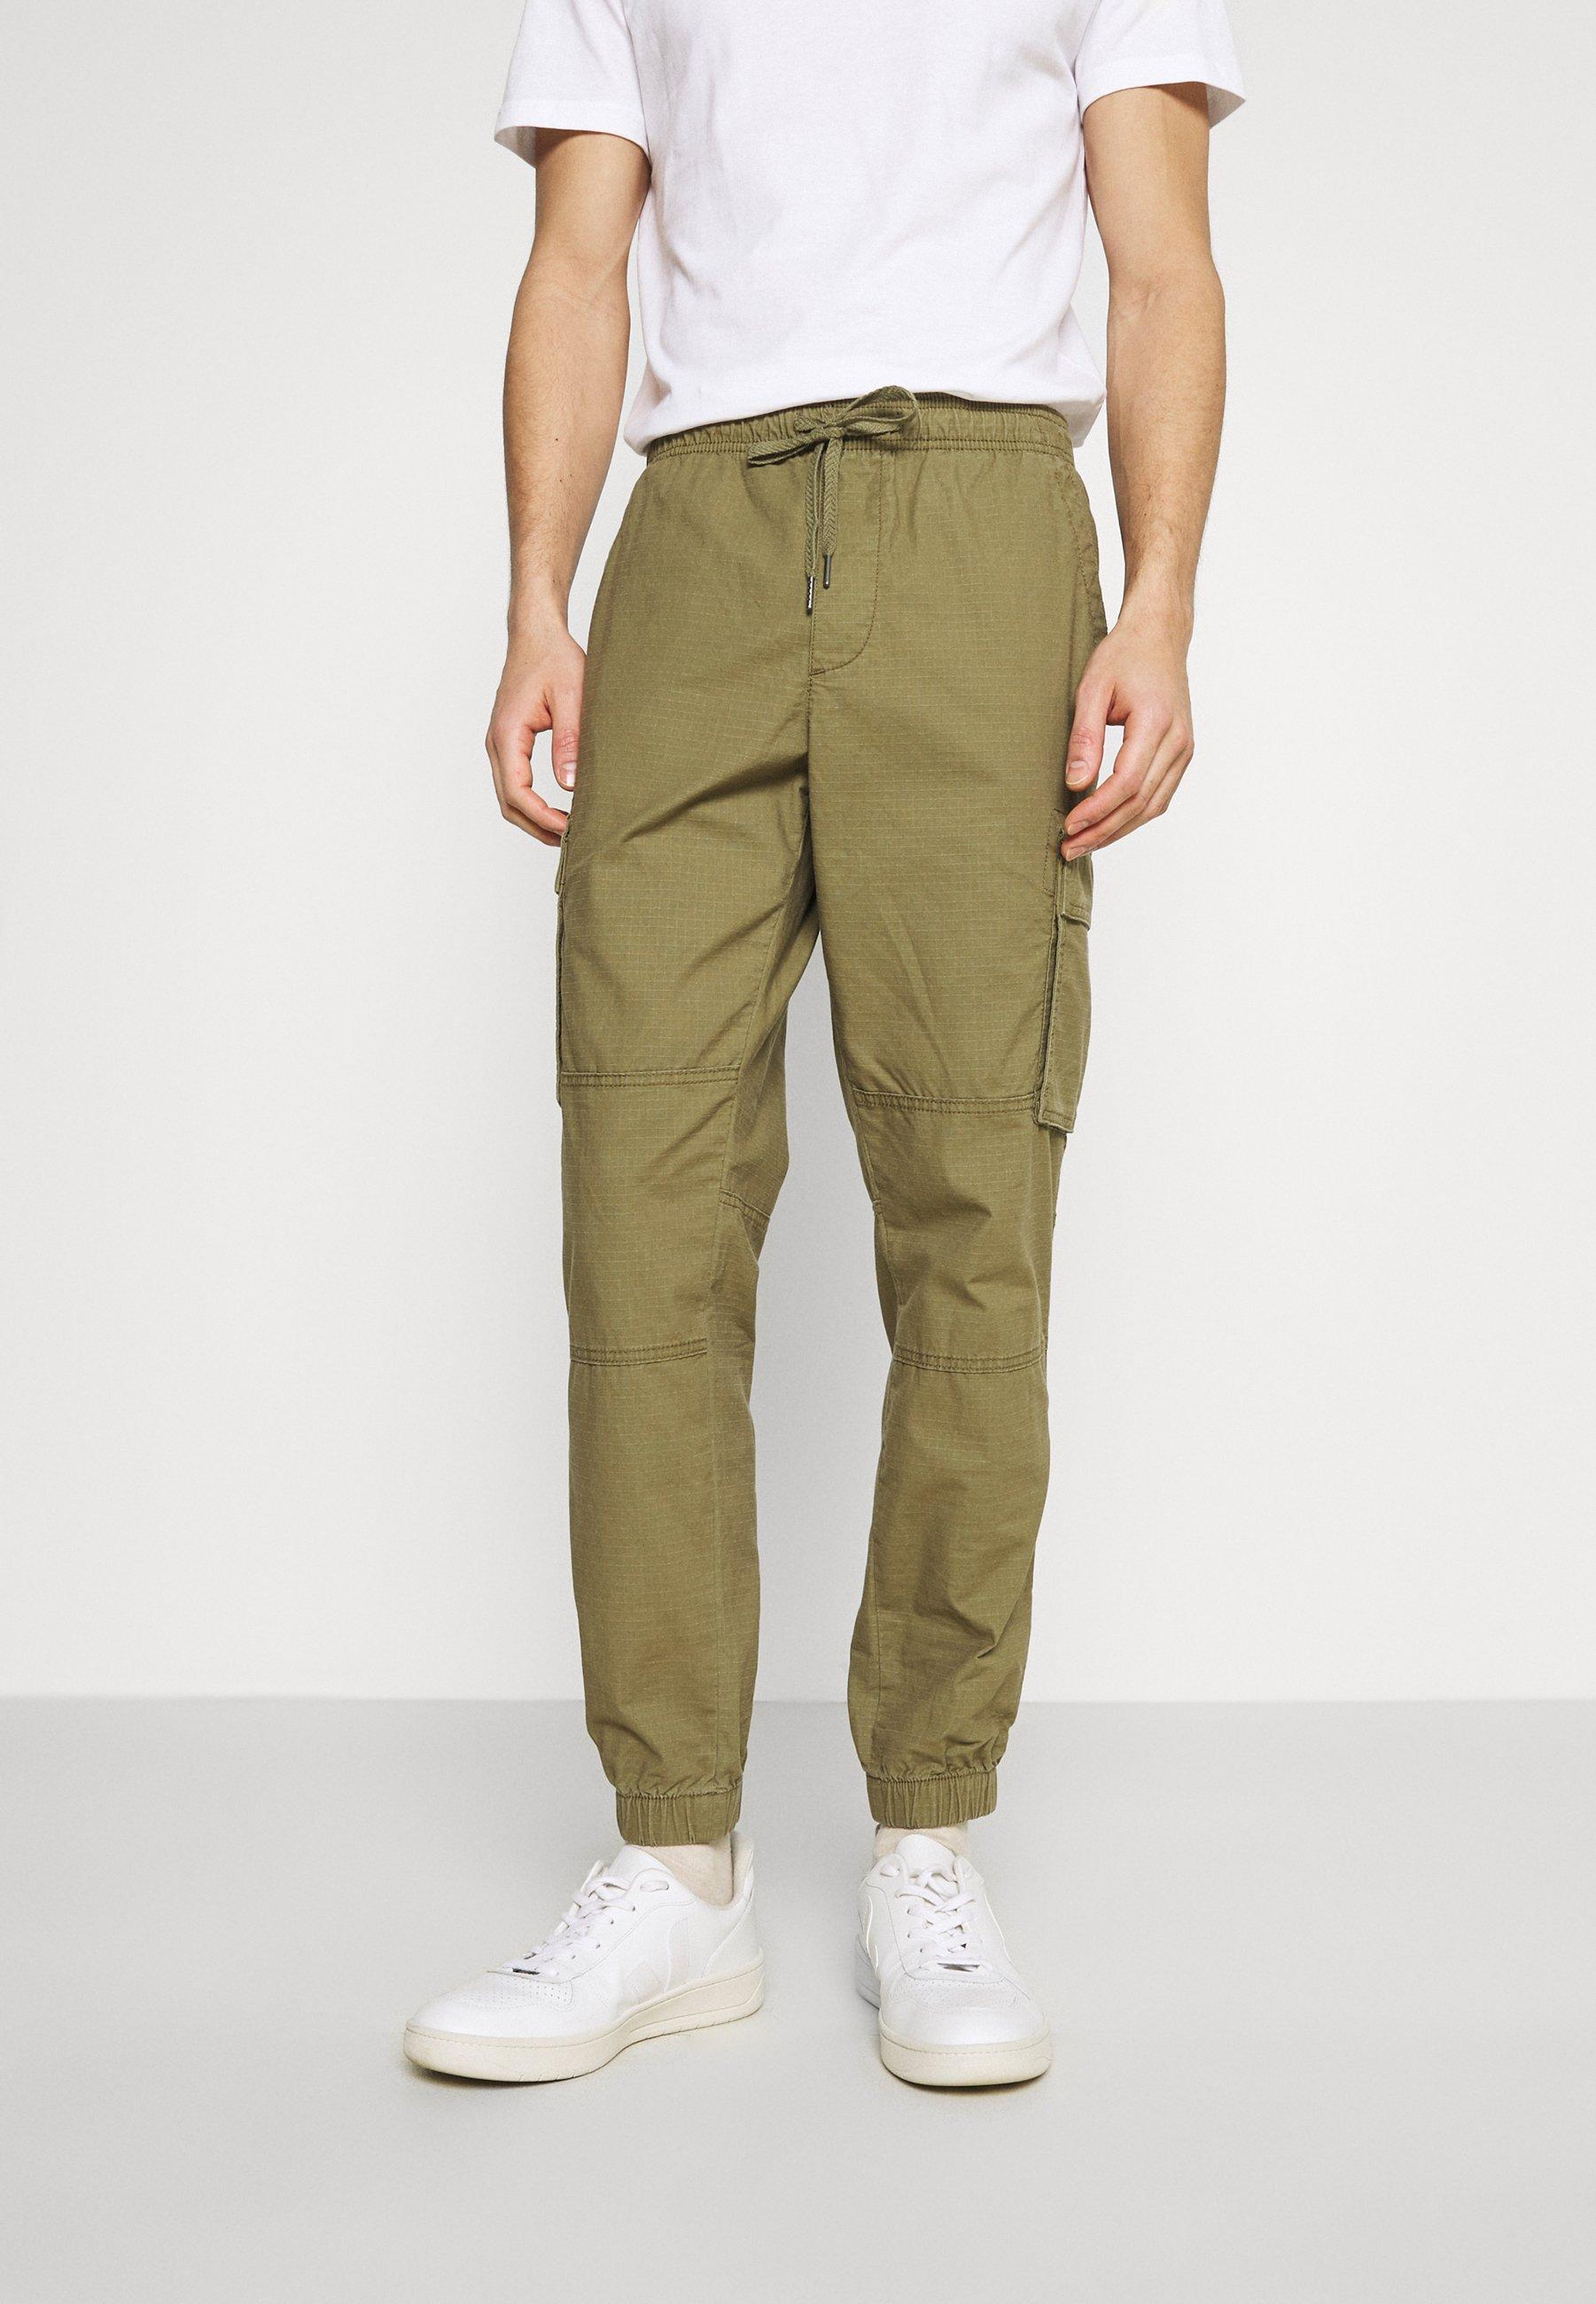 Homme JOGGER - Pantalon cargo - green khaki